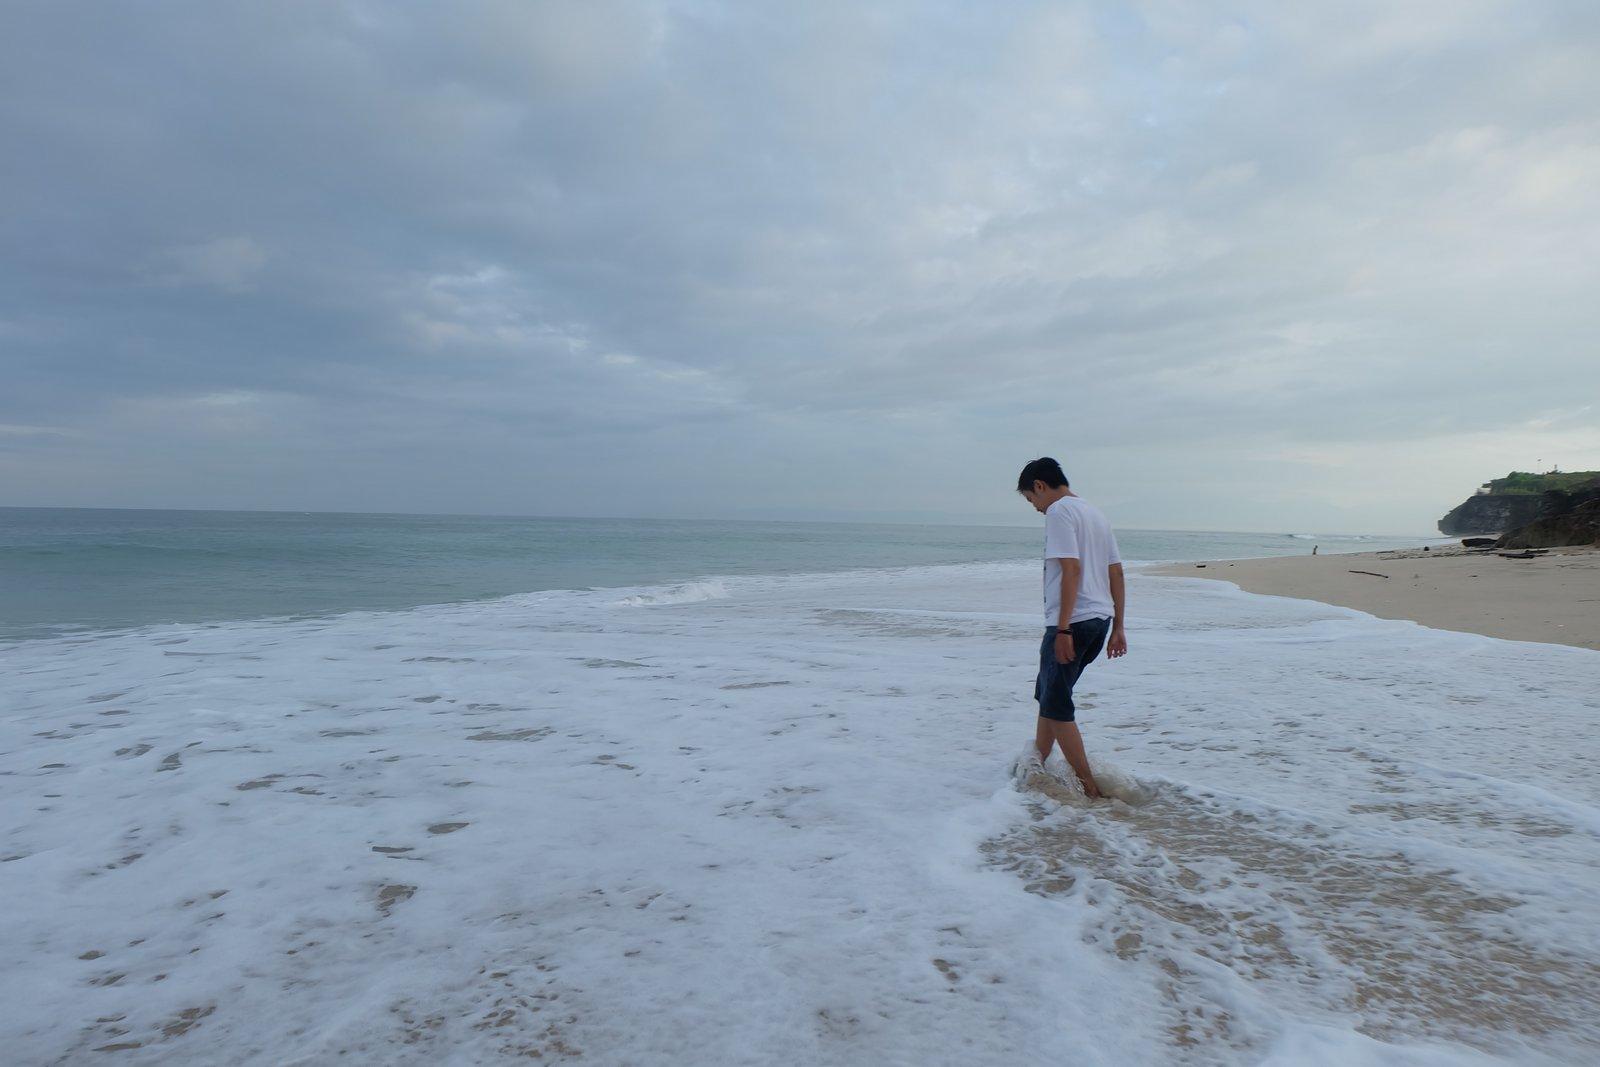 Bangun Dari Mimpi Dan Lekas Ke Pantai Di Tanah Impian Dreamland Bali